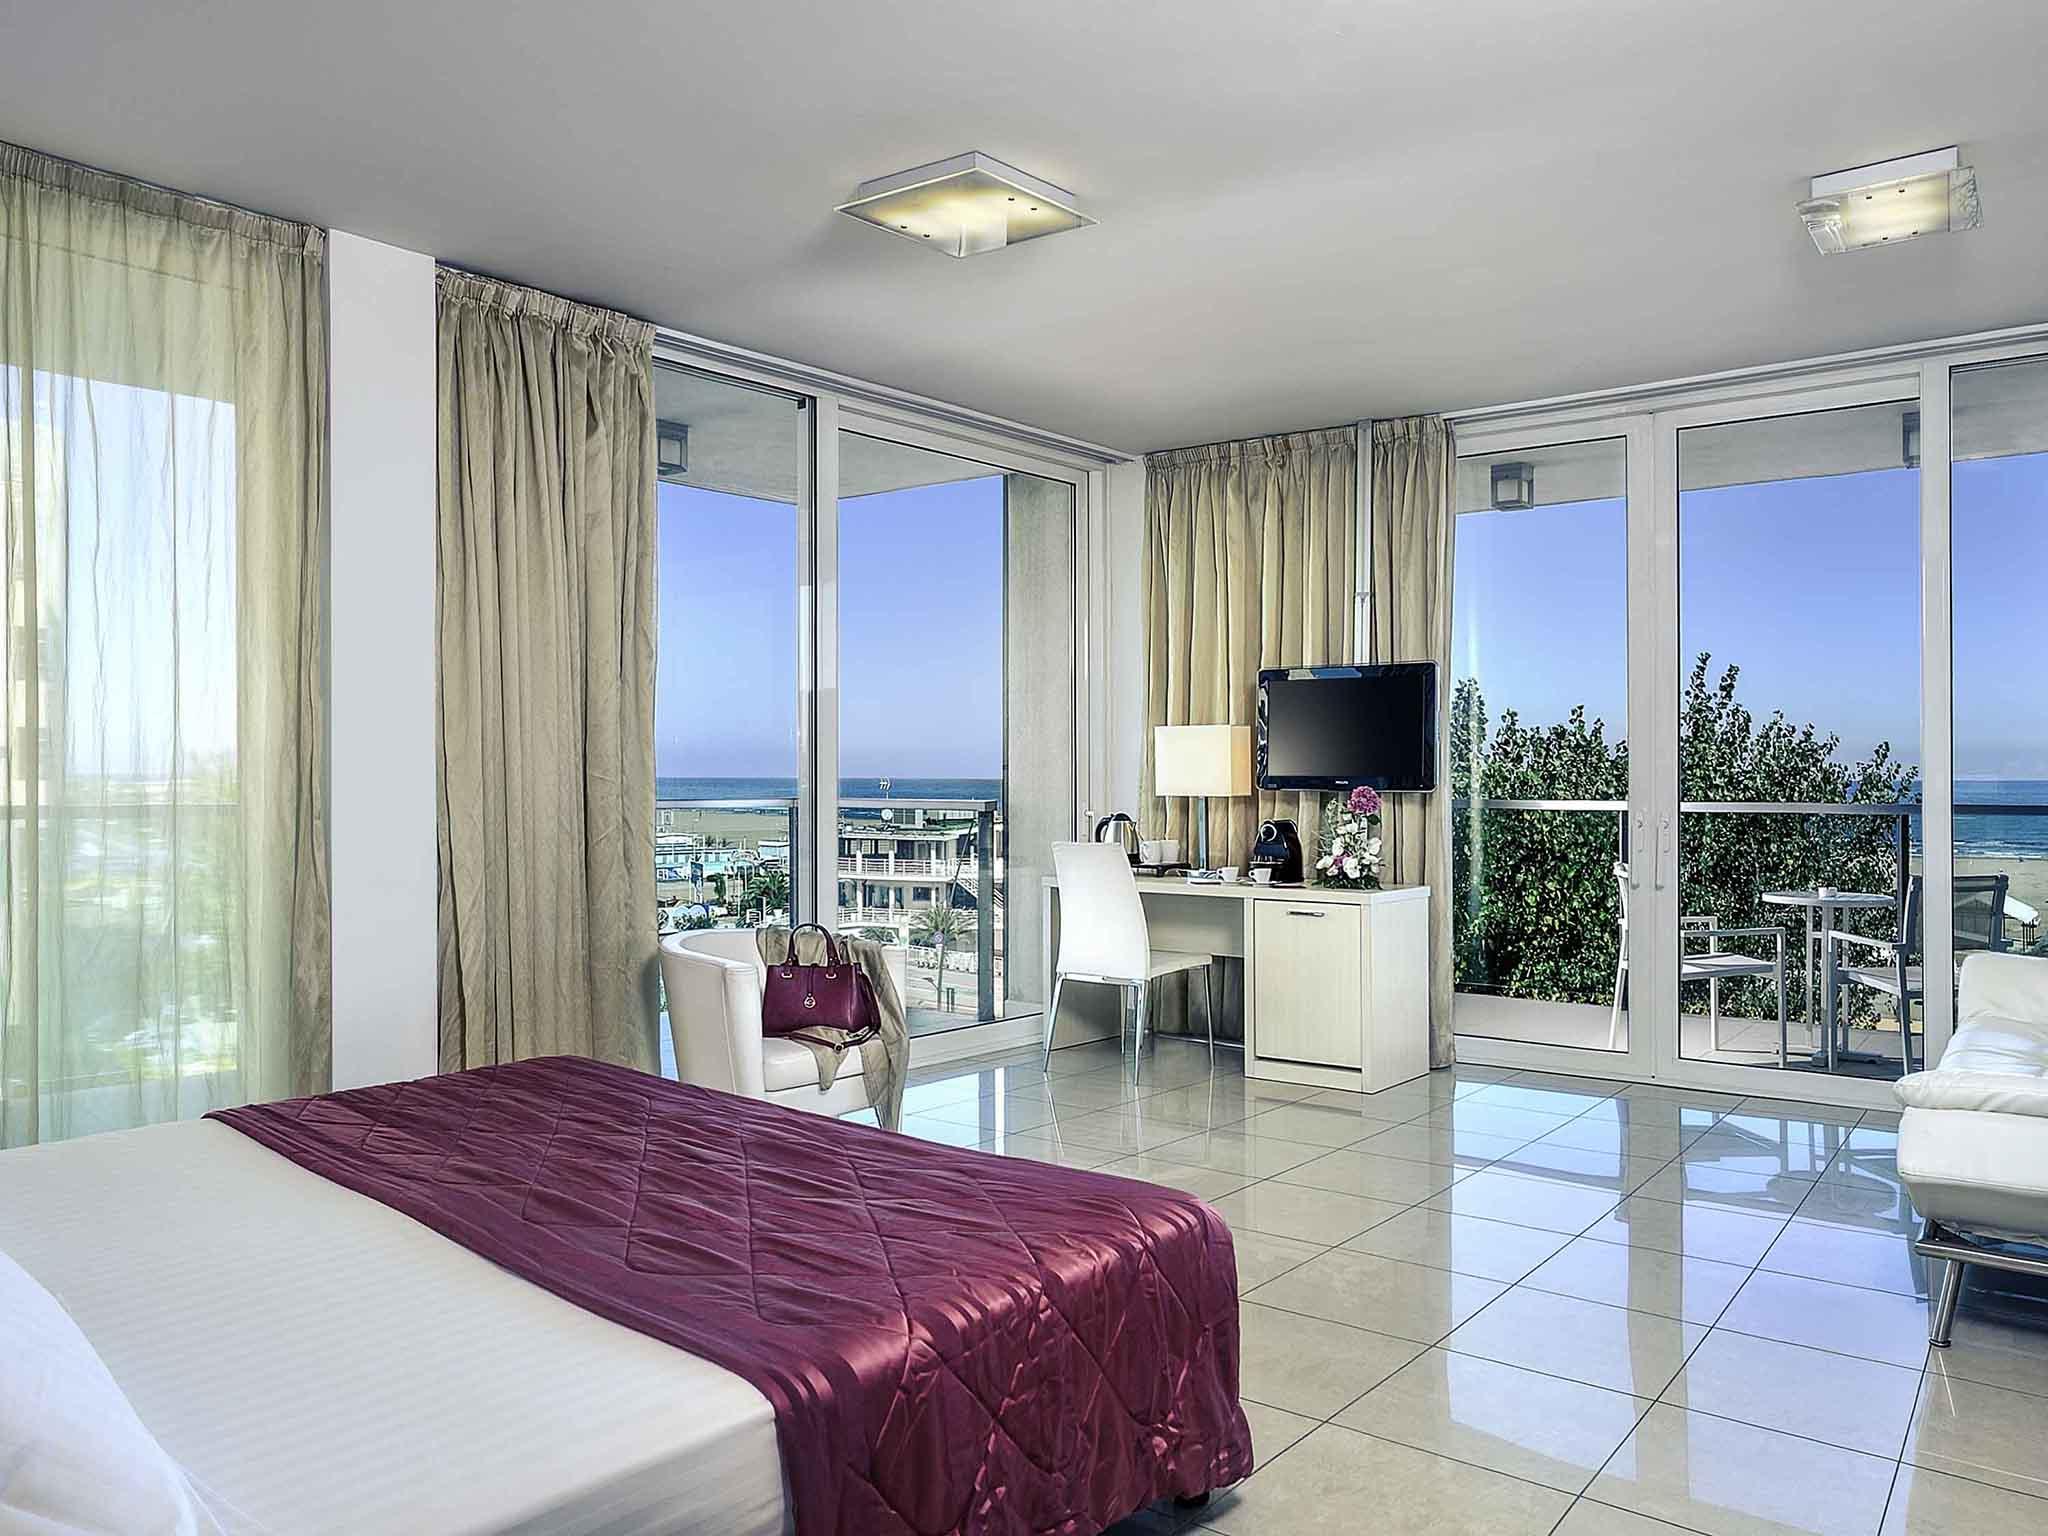 Hotel Mercure Rimini Artis